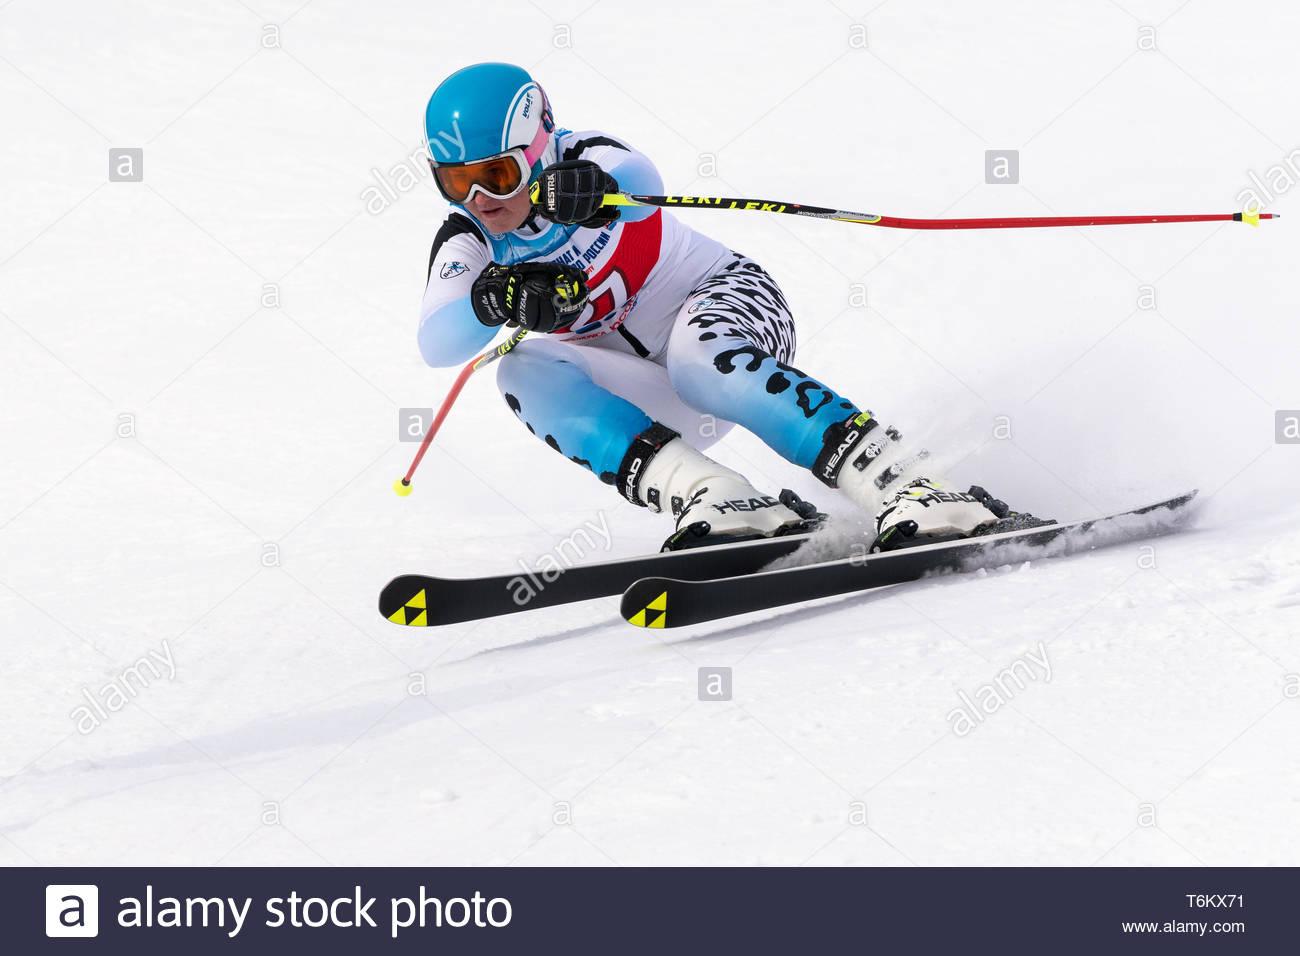 KAMCHATKA PENINSULA, RUSSIA - APR 2, 2019: Mountain skier Veronika Gavrish (Murmansk) skiing down mount slope. International Ski Federation Championsh - Stock Image